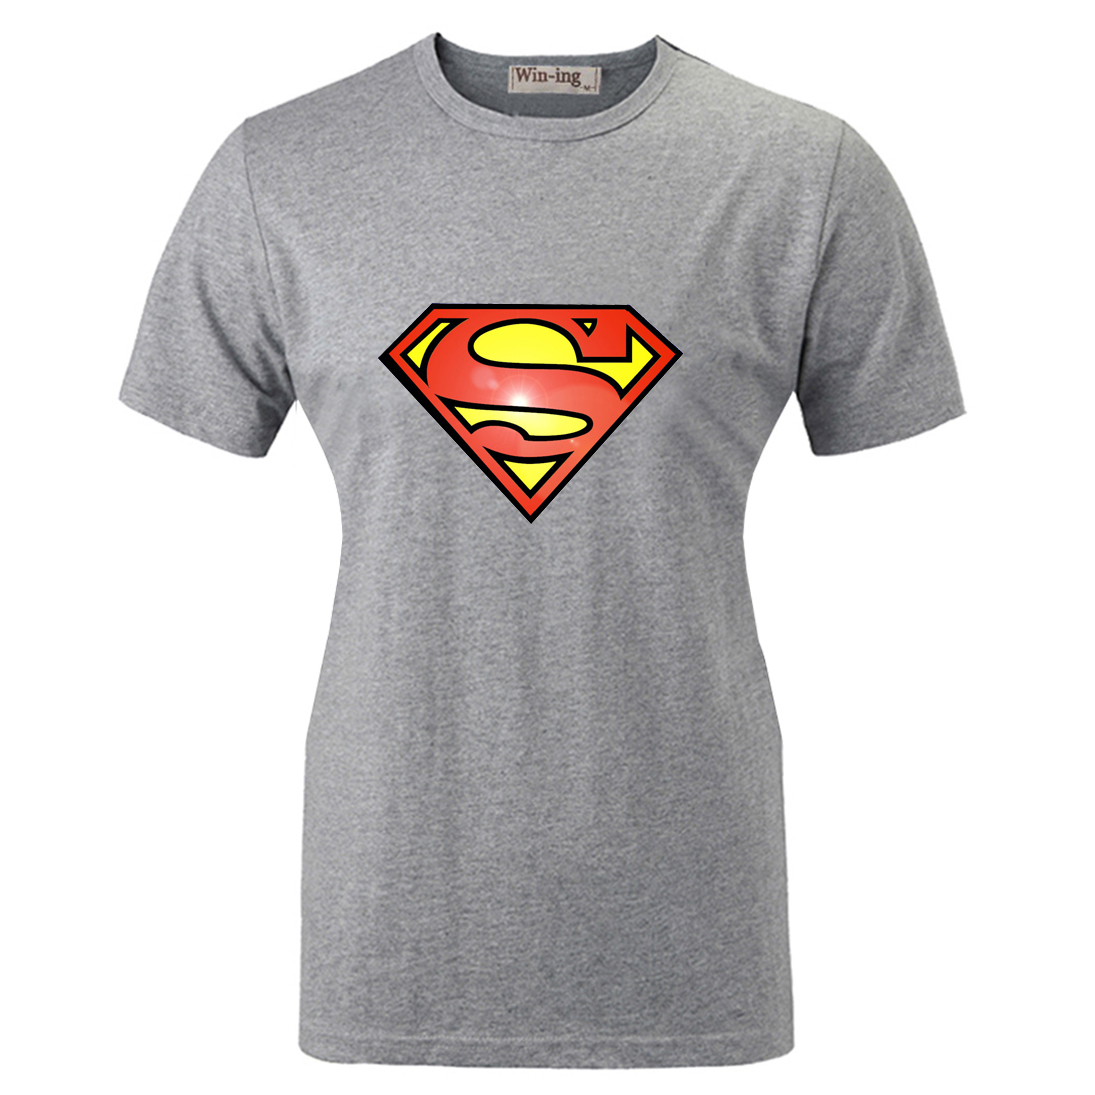 Summer Fashion Casual Cotton Round Neck T shirt America Super Hero Superman Graphic Women Girl Short Sleeves T-shirt Tops